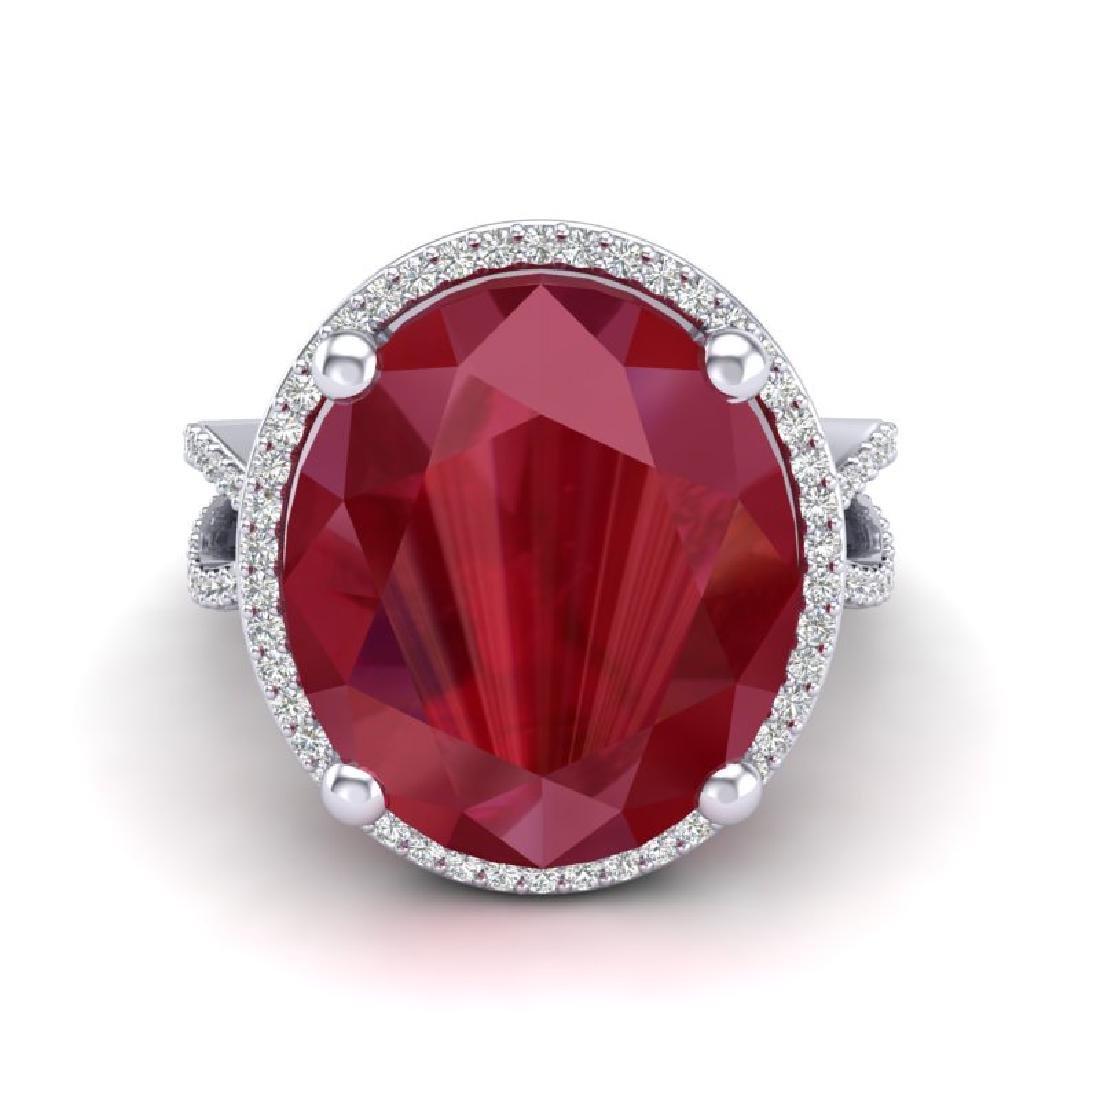 12 CTW Ruby & Micro Pave VS/SI Diamond Halo Ring 18K